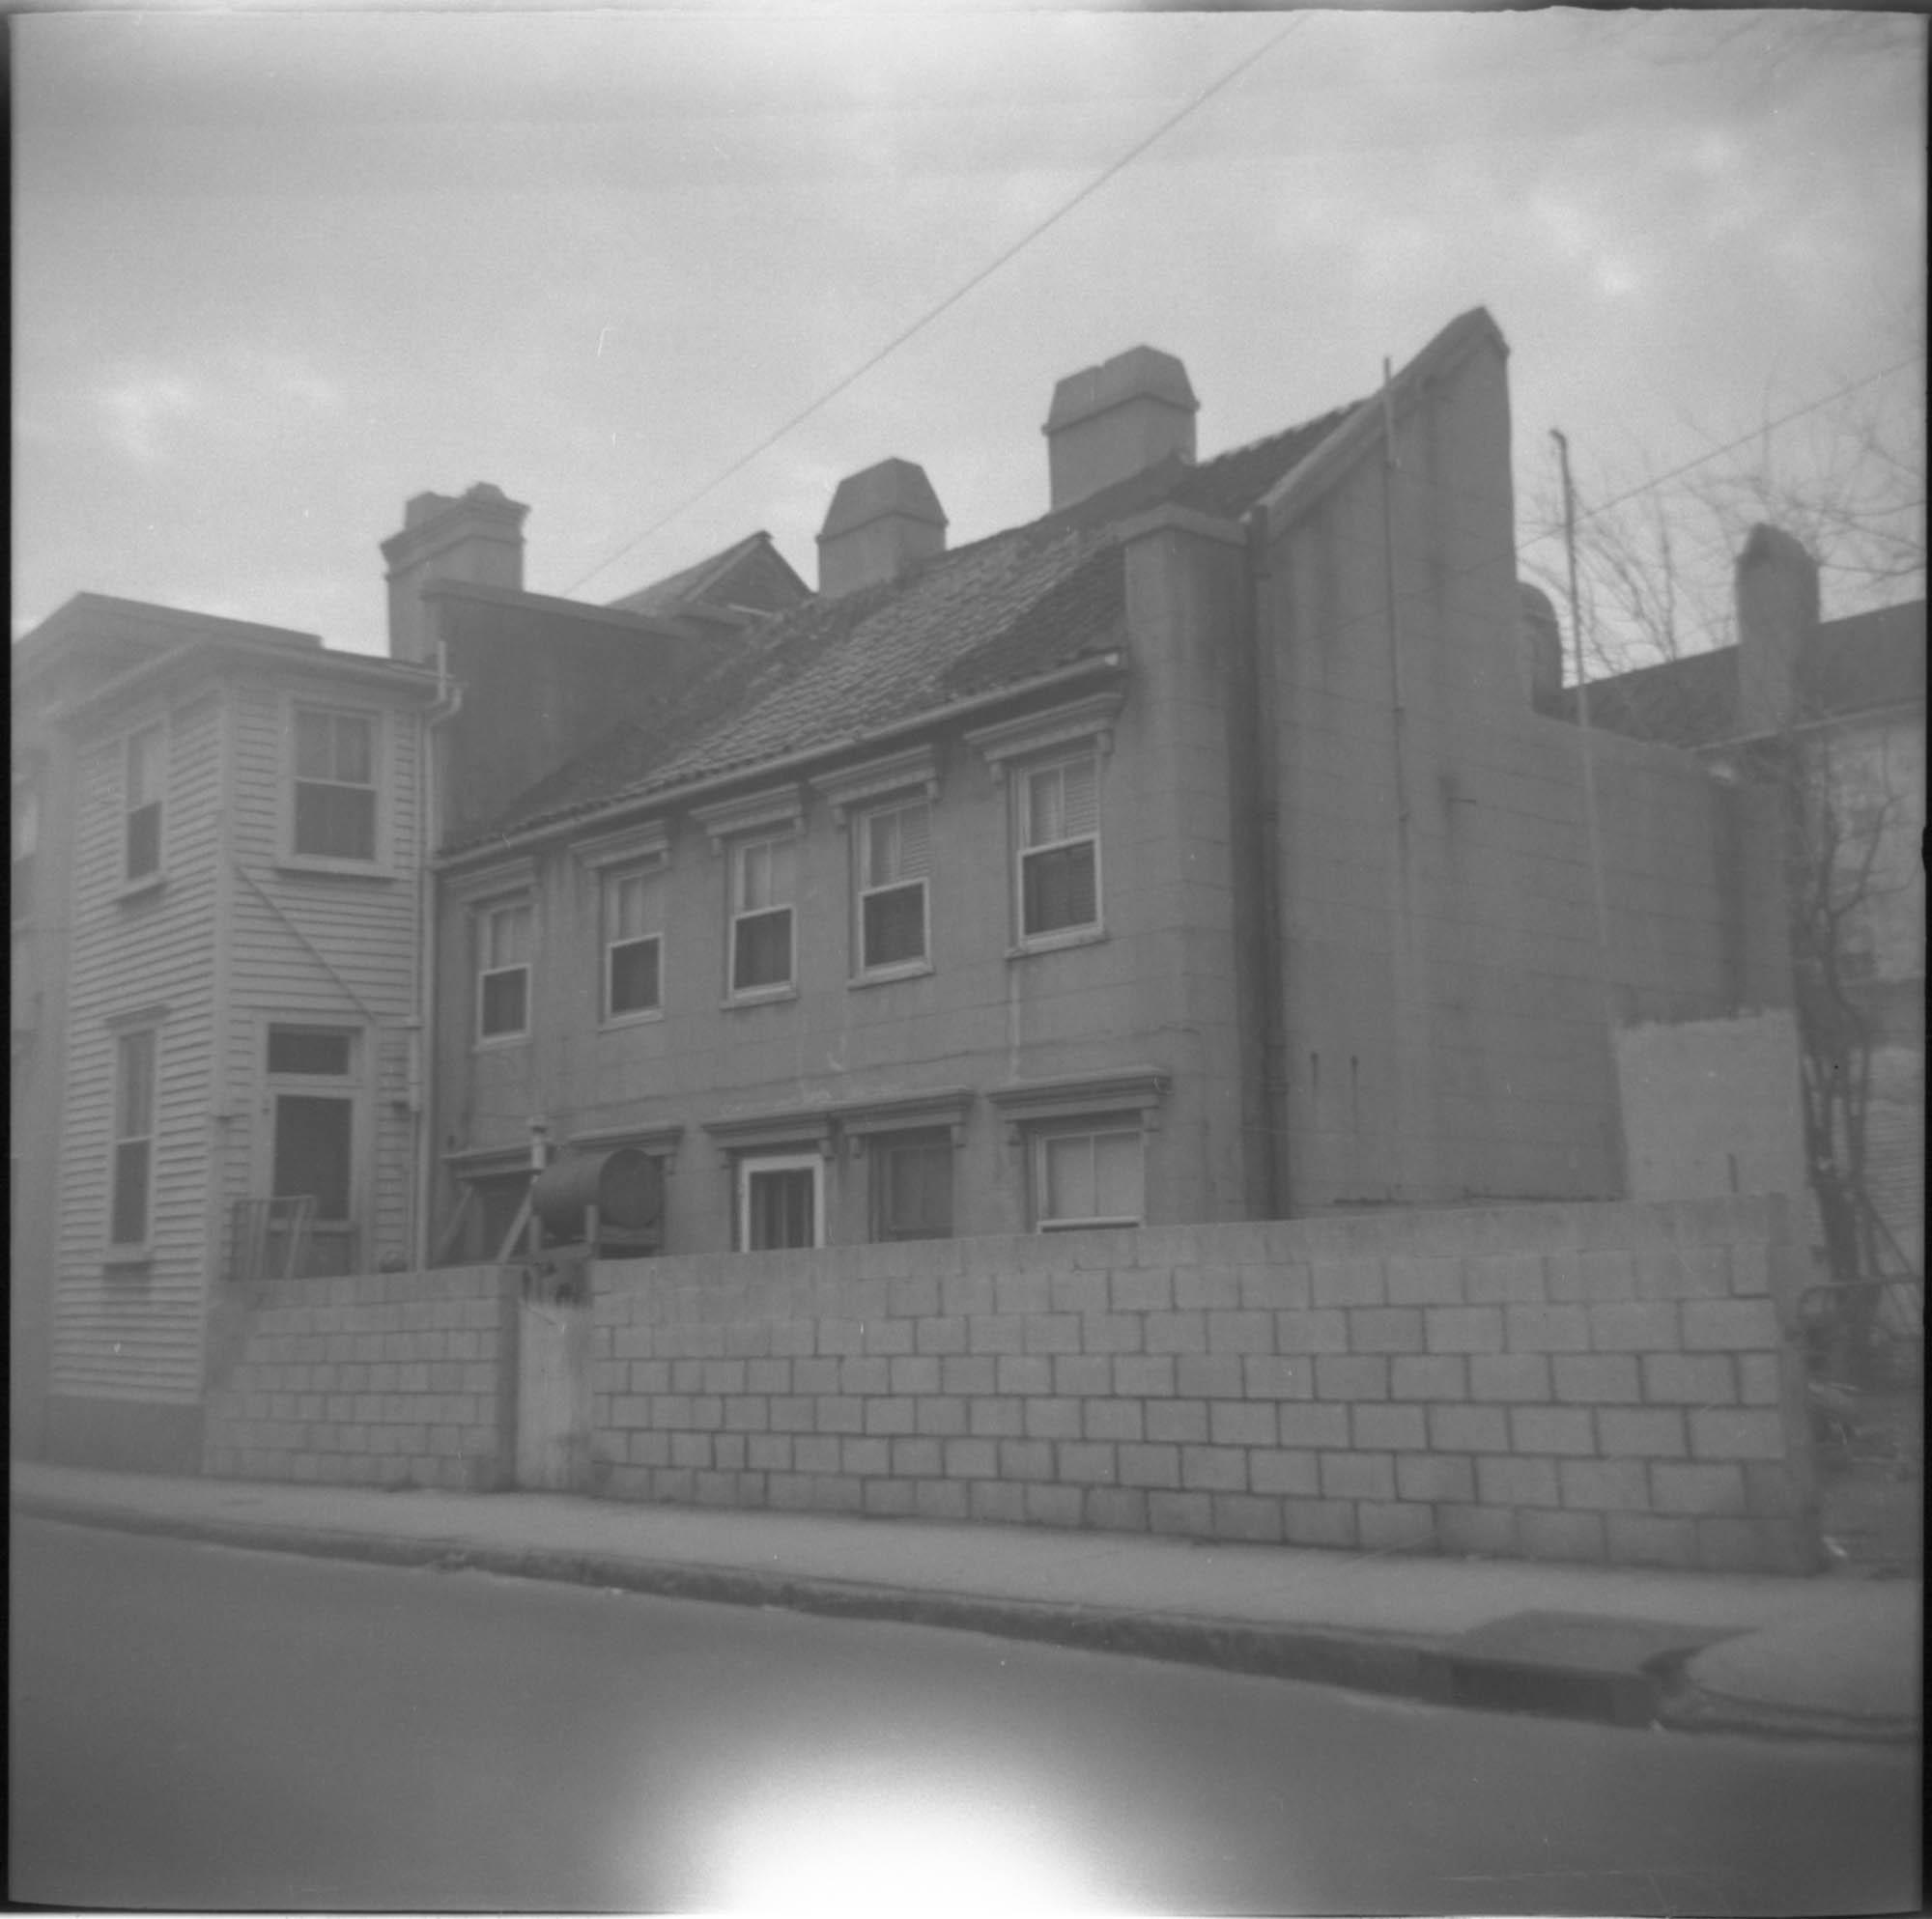 53 Anson Street (Rear)